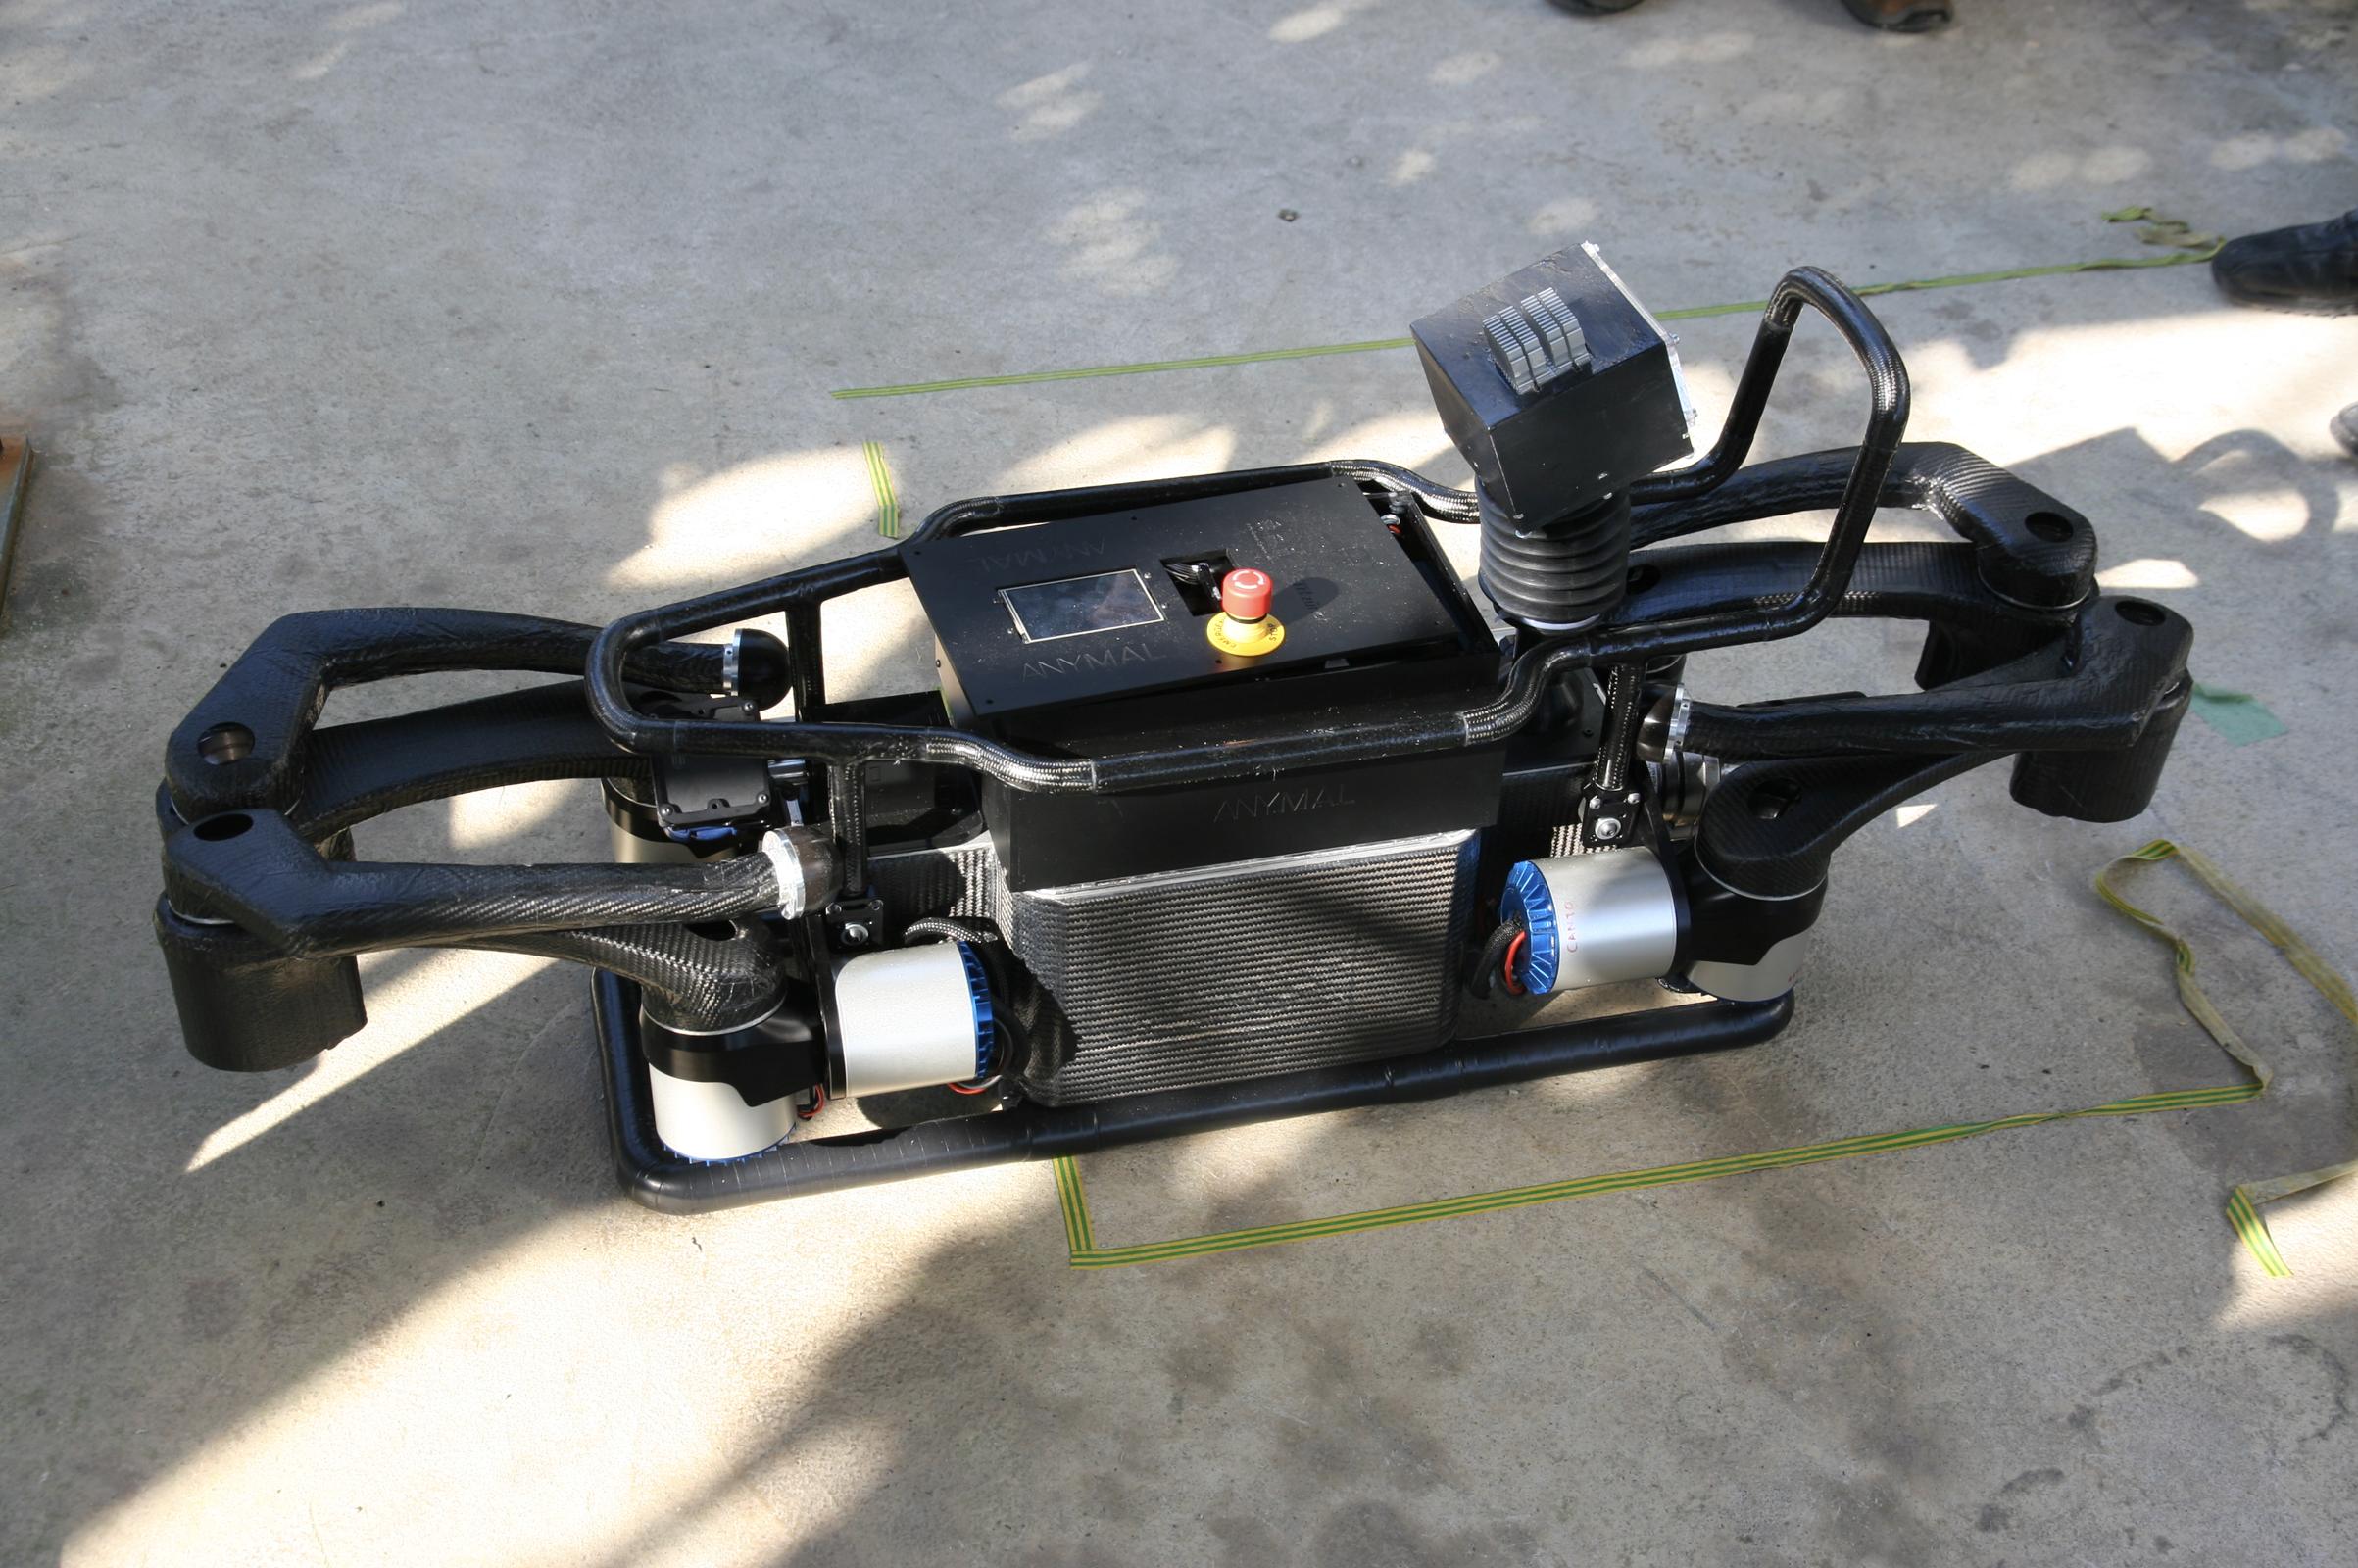 ANYmal Robot Image 8